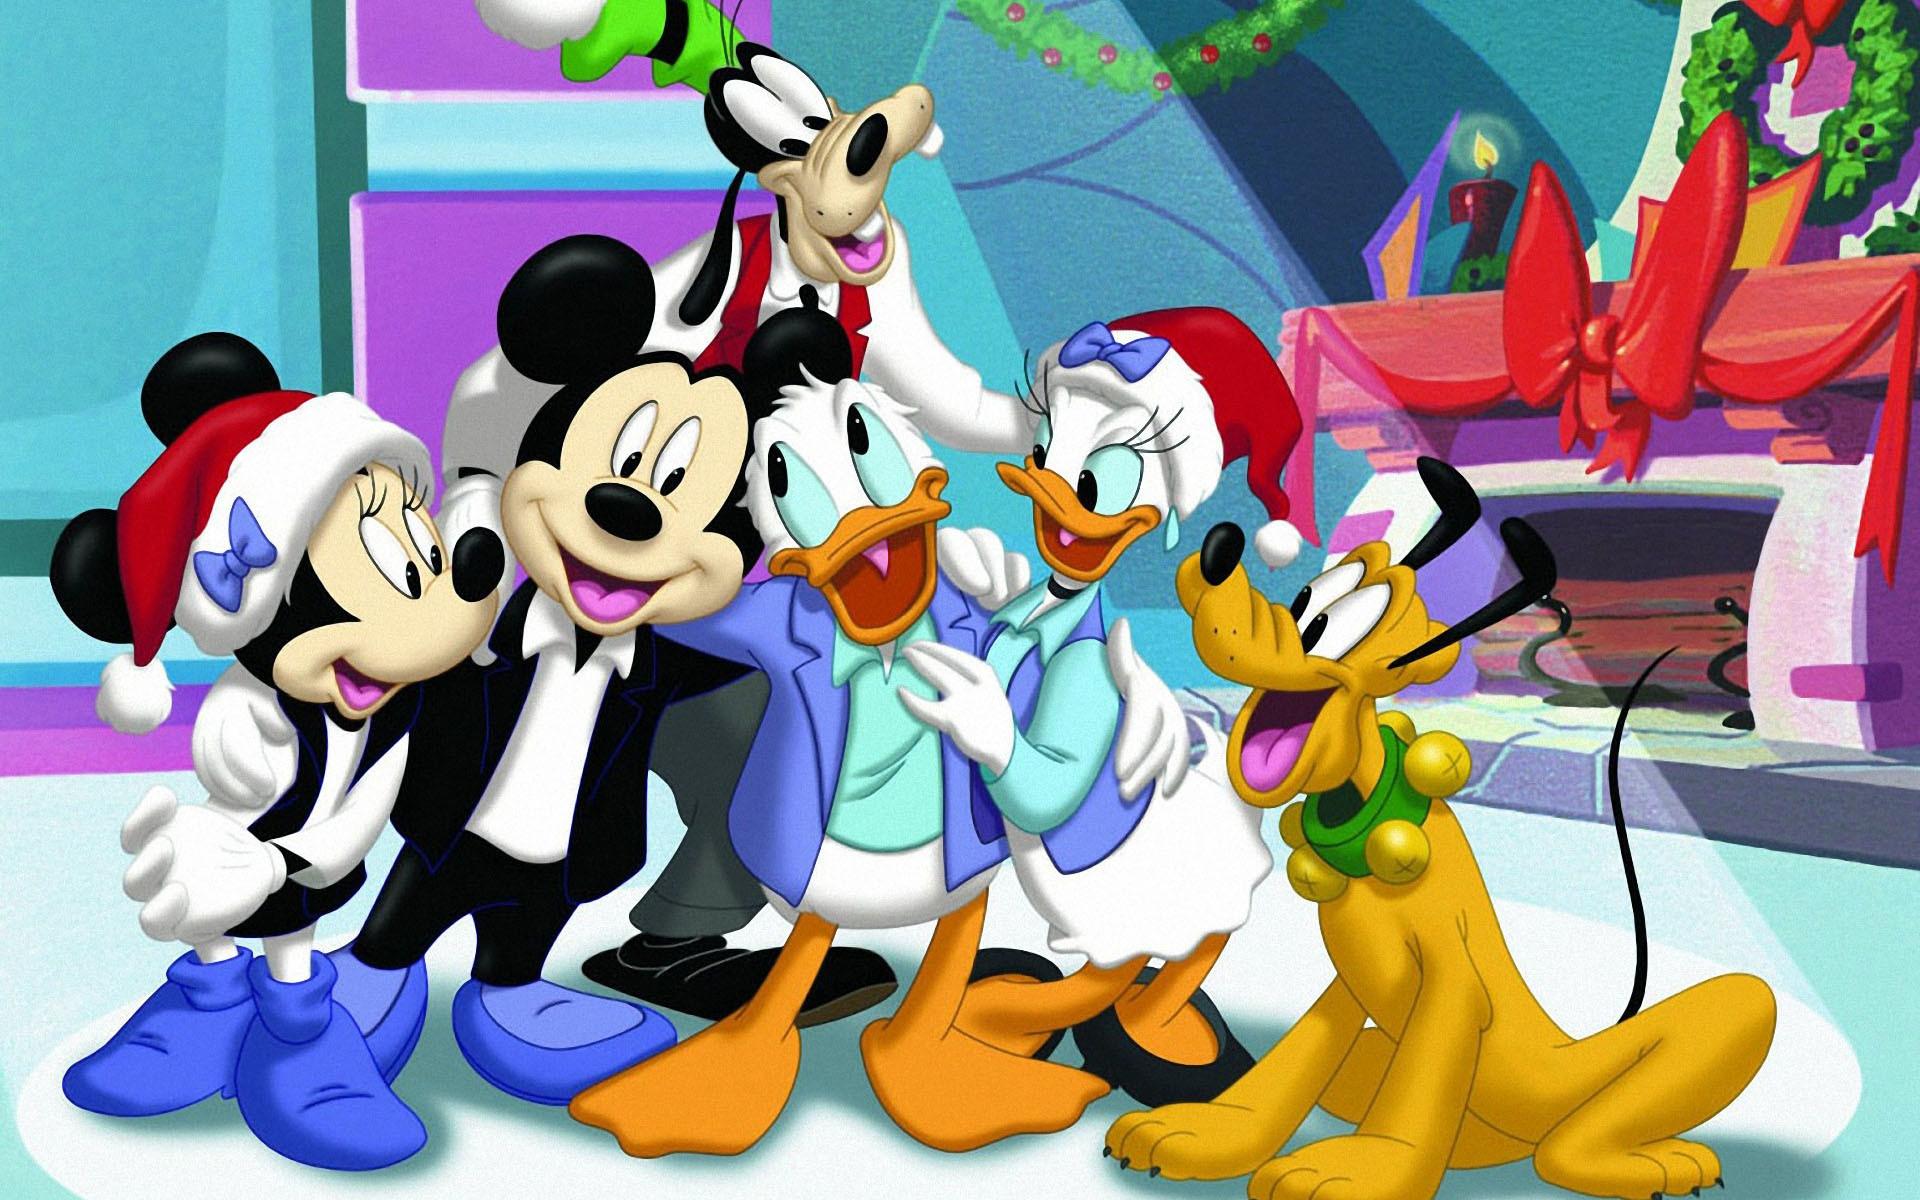 Great Wallpaper Halloween Mickey Mouse - 812592-disney-cartoon-wallpaper-1920x1200-full-hd  Graphic_701330.jpg